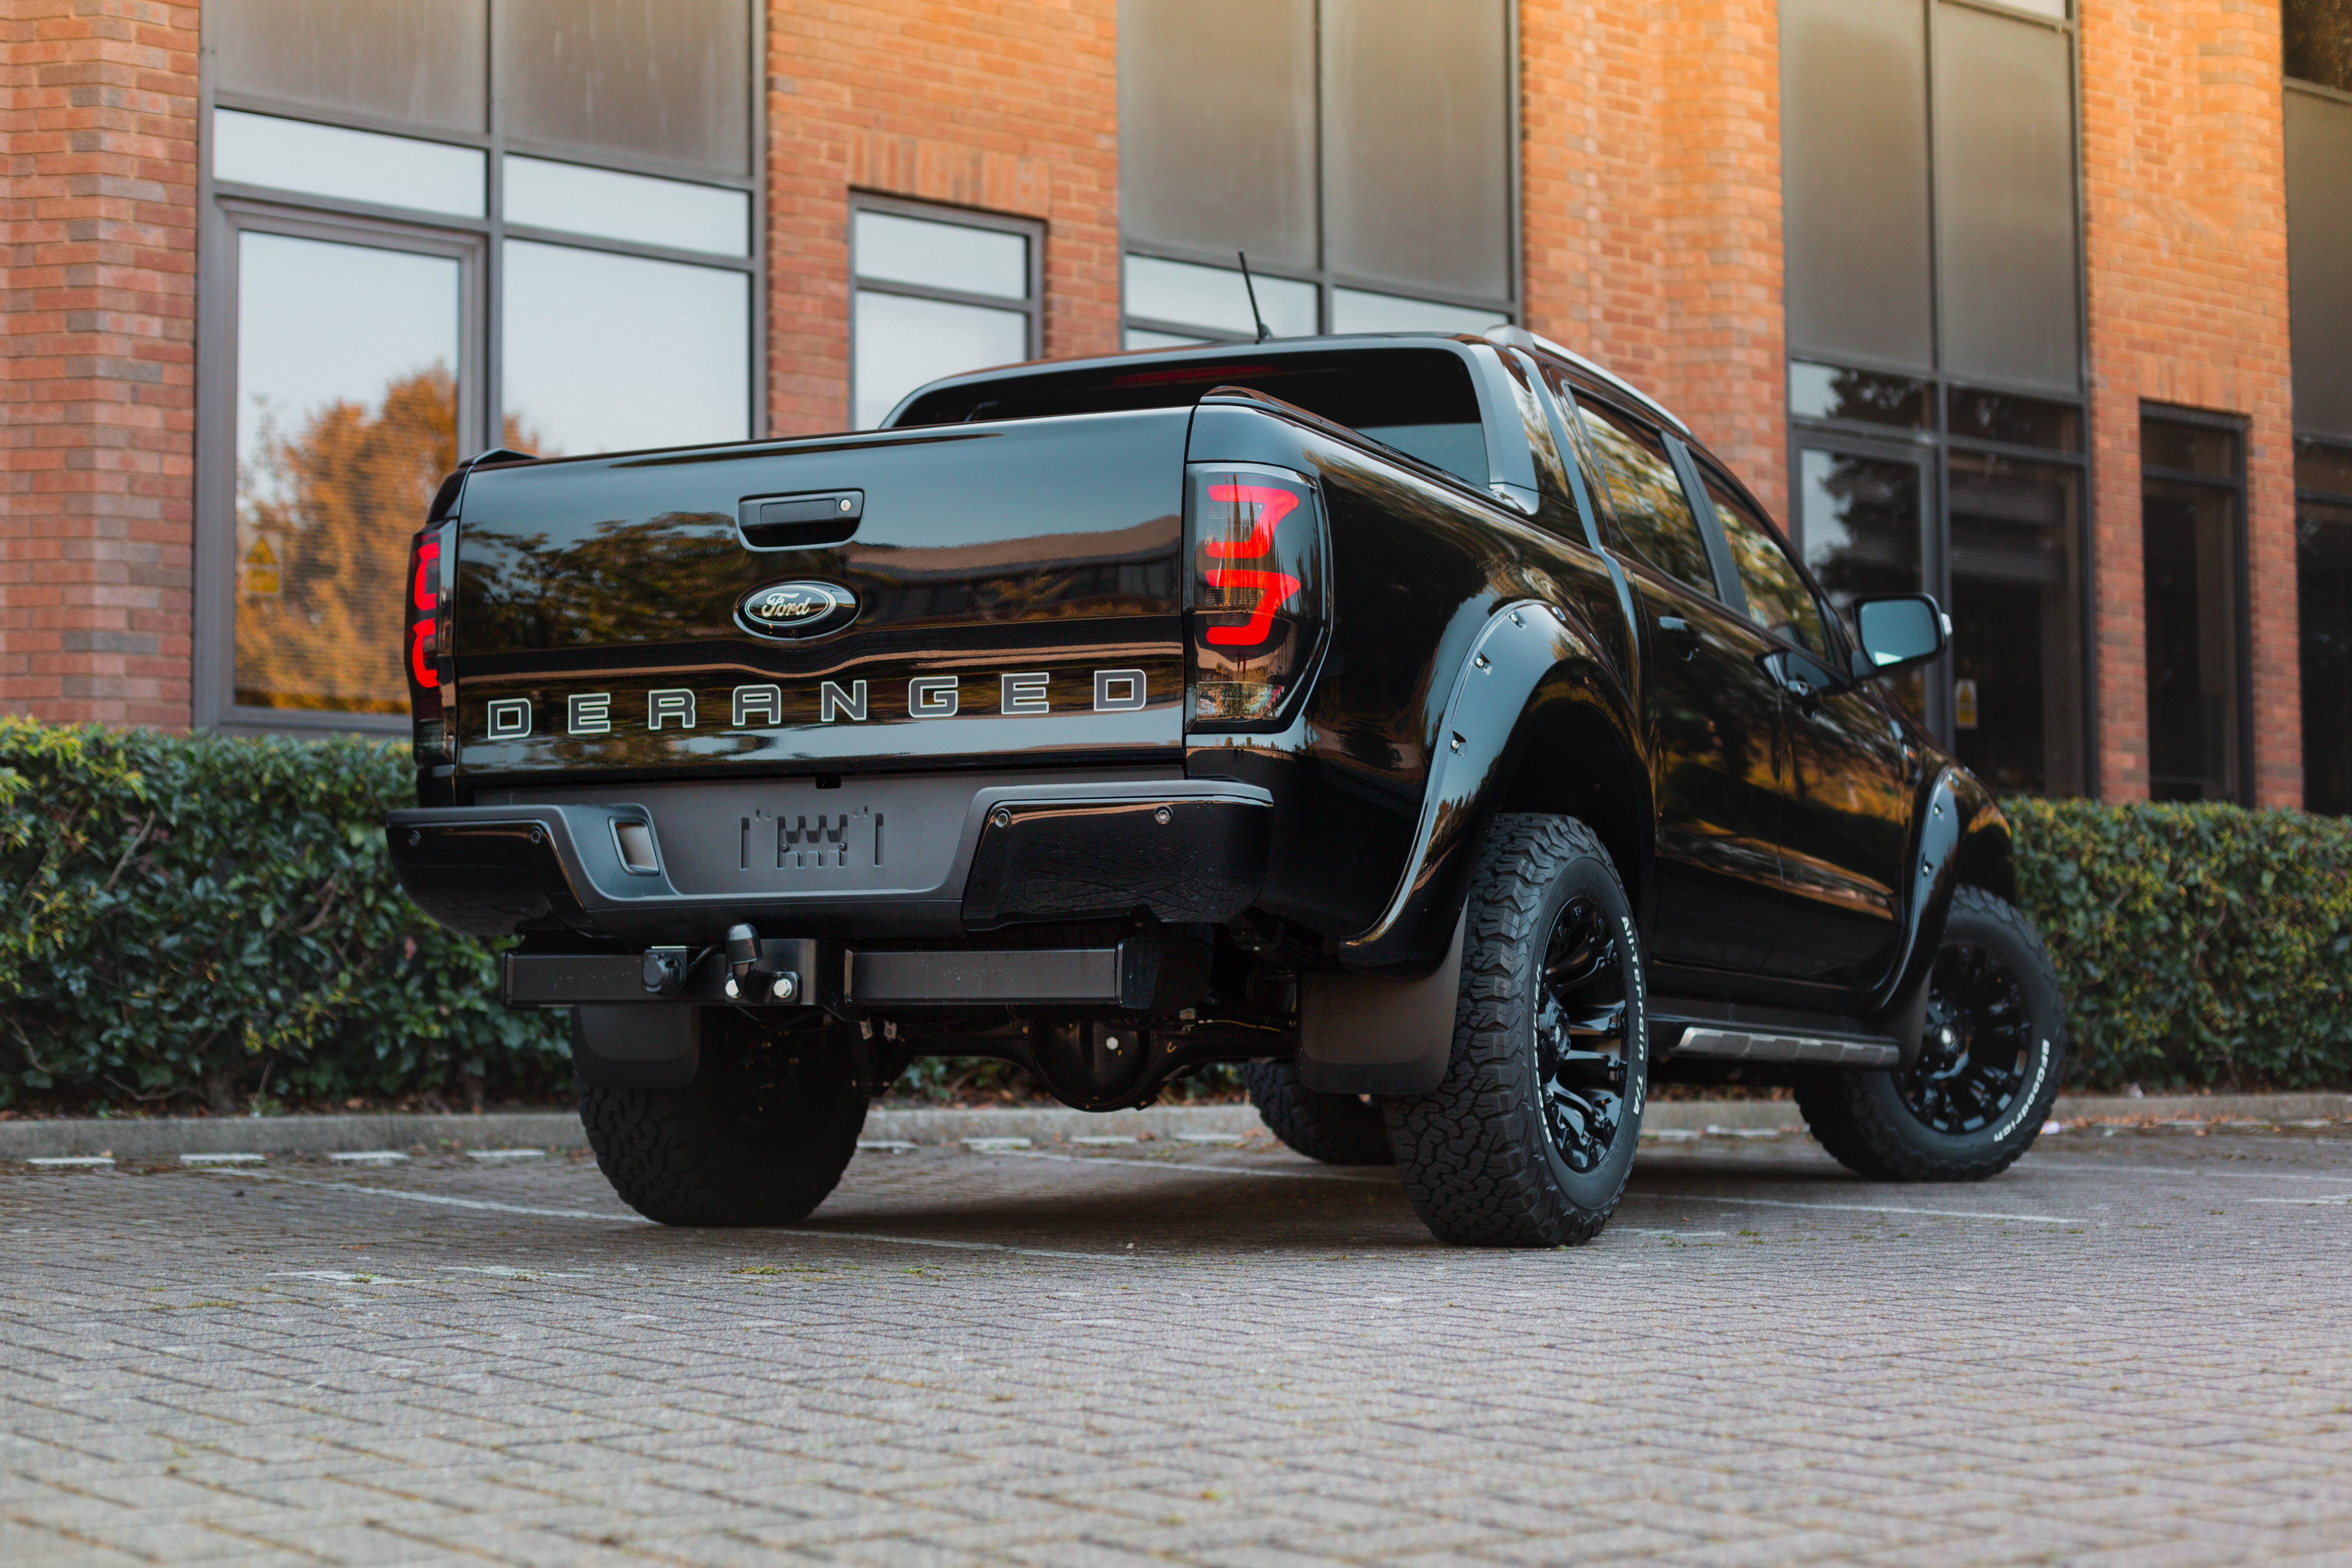 2020 69 Deranged Ford Ranger Wildtrak 2 0 Bi Turbo